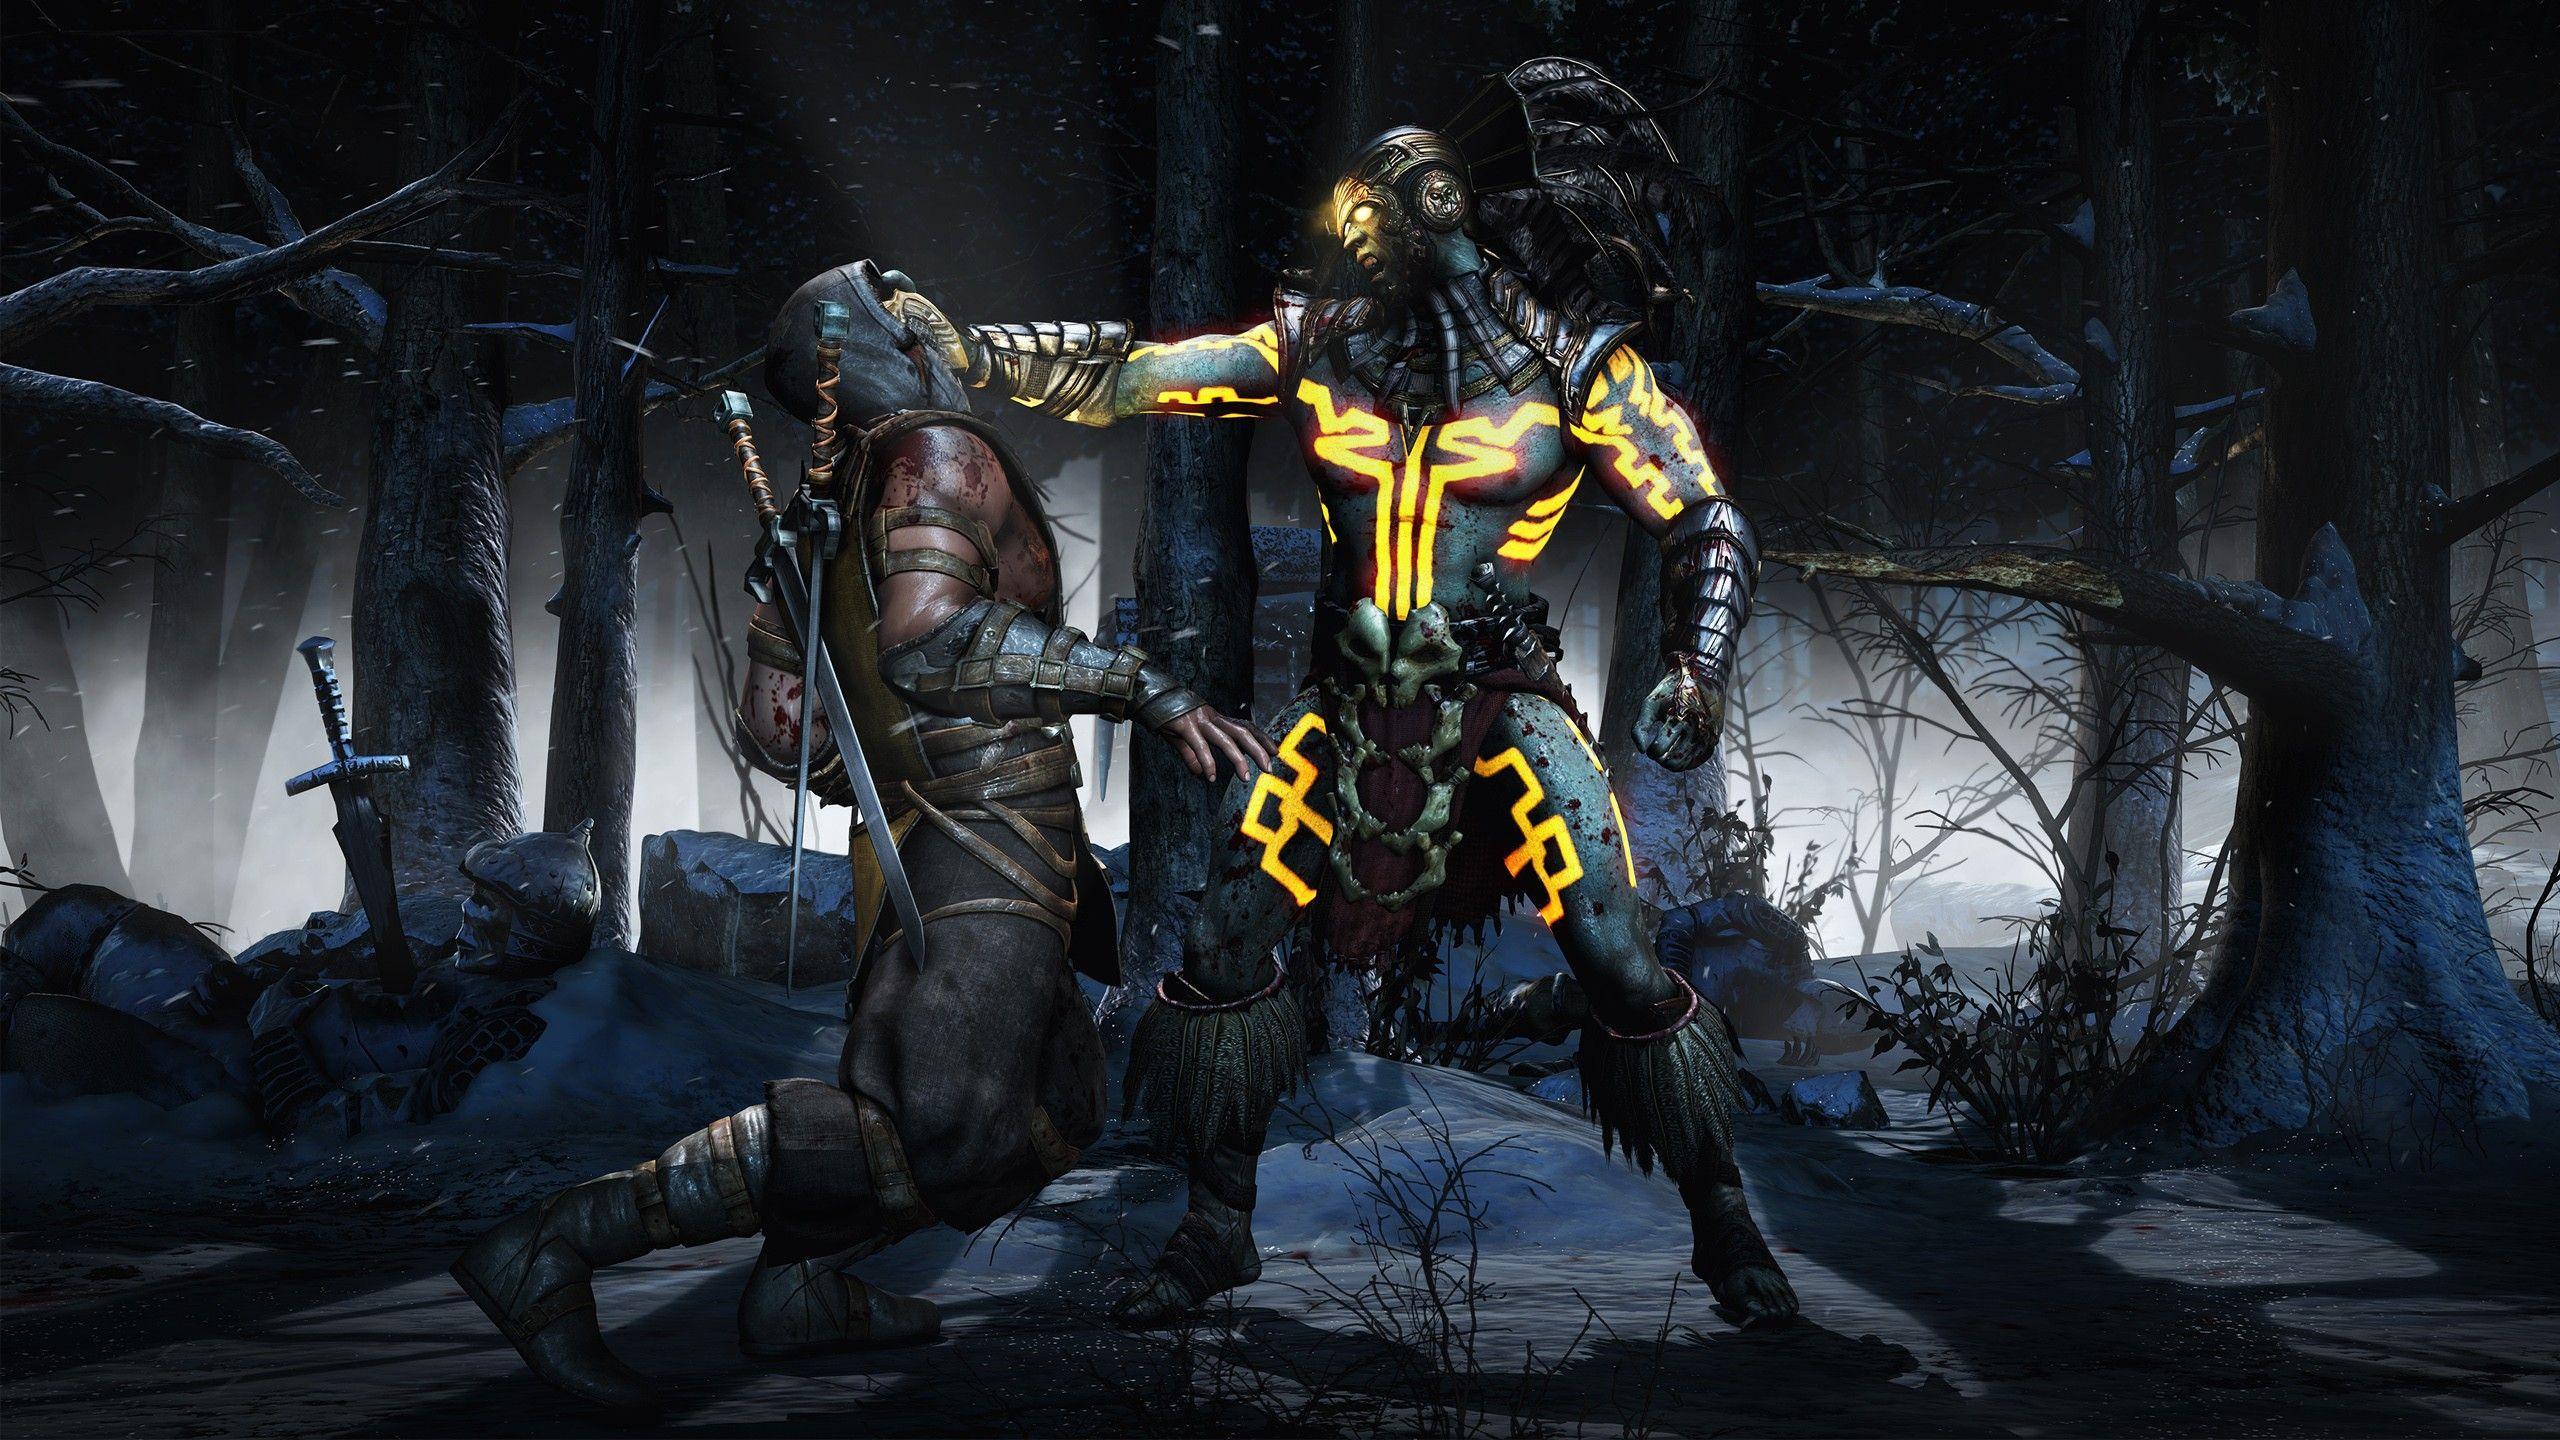 Mortal Kombat X Wallpapers: Mortal Kombat XL Wallpapers